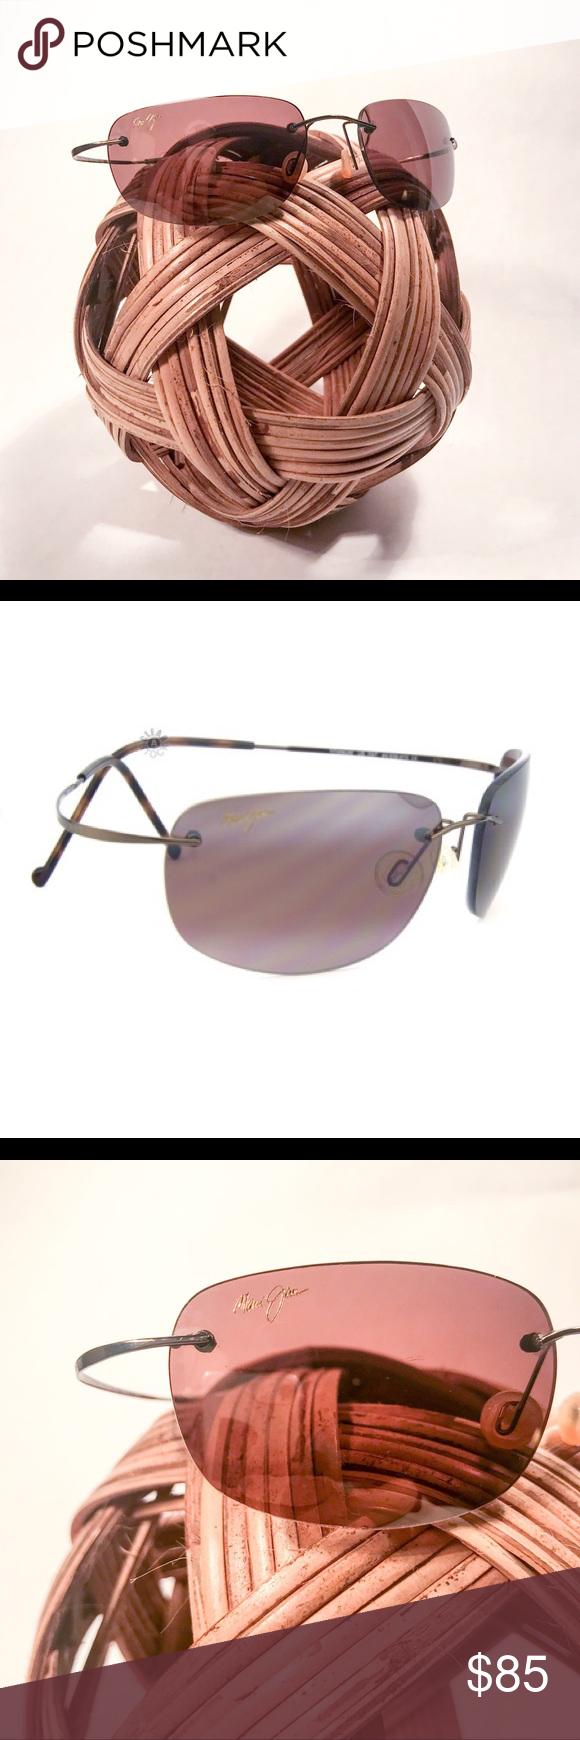 ac2caf067304 MAUI JIM KAPALUA Sport Titanium Sunglasses 502-23 Authentic Maui Jim  Sunglasses Ultra-lightweight